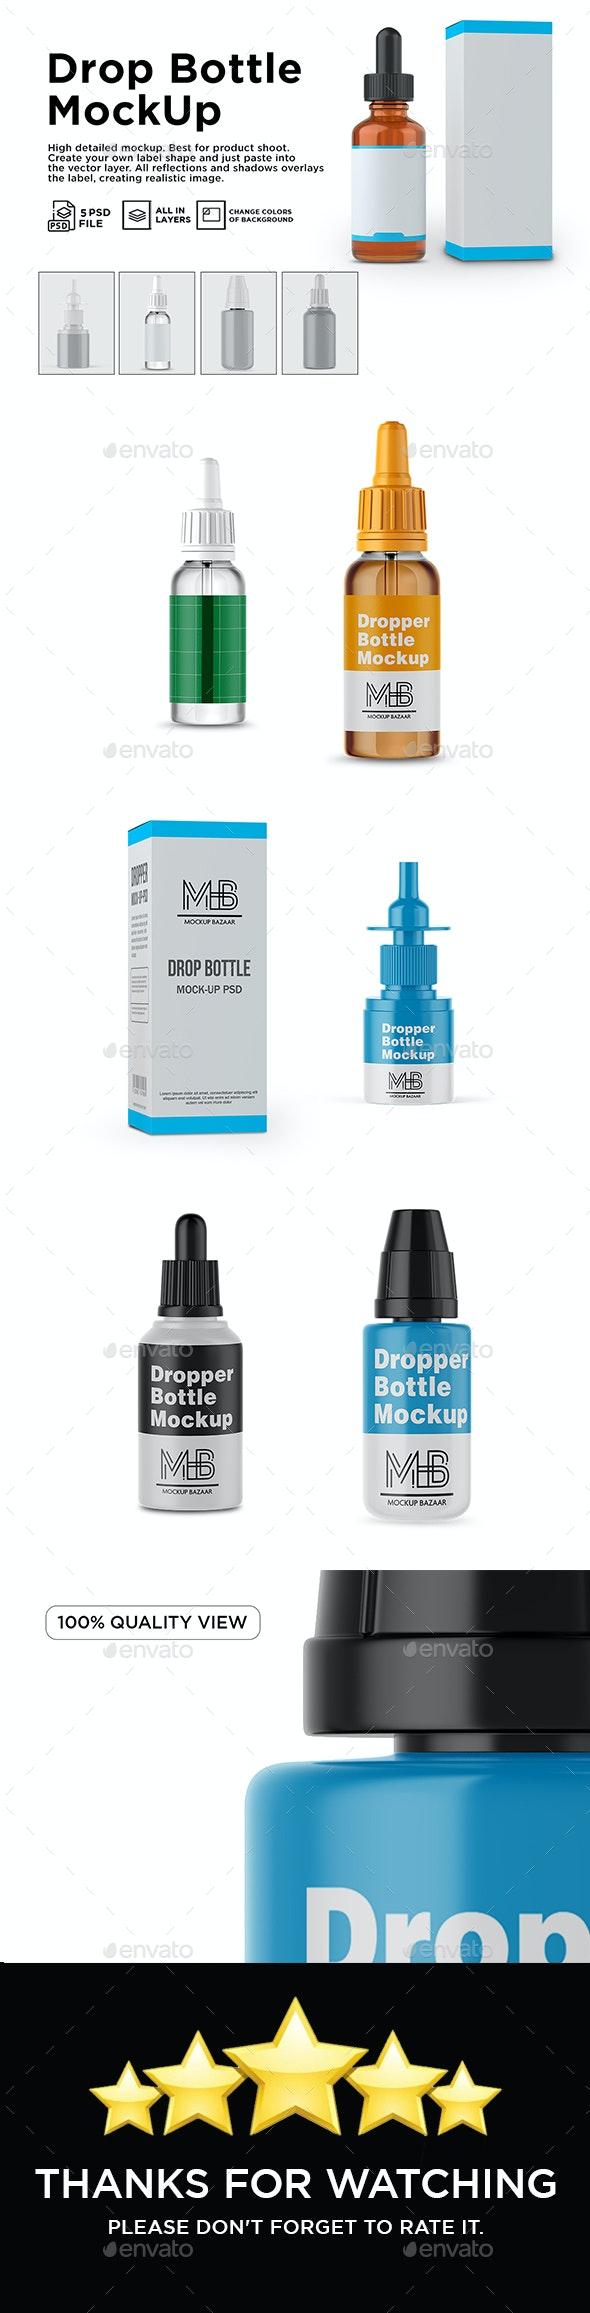 Dropper Bottle & Box Mockup - Product Mock-Ups Graphics